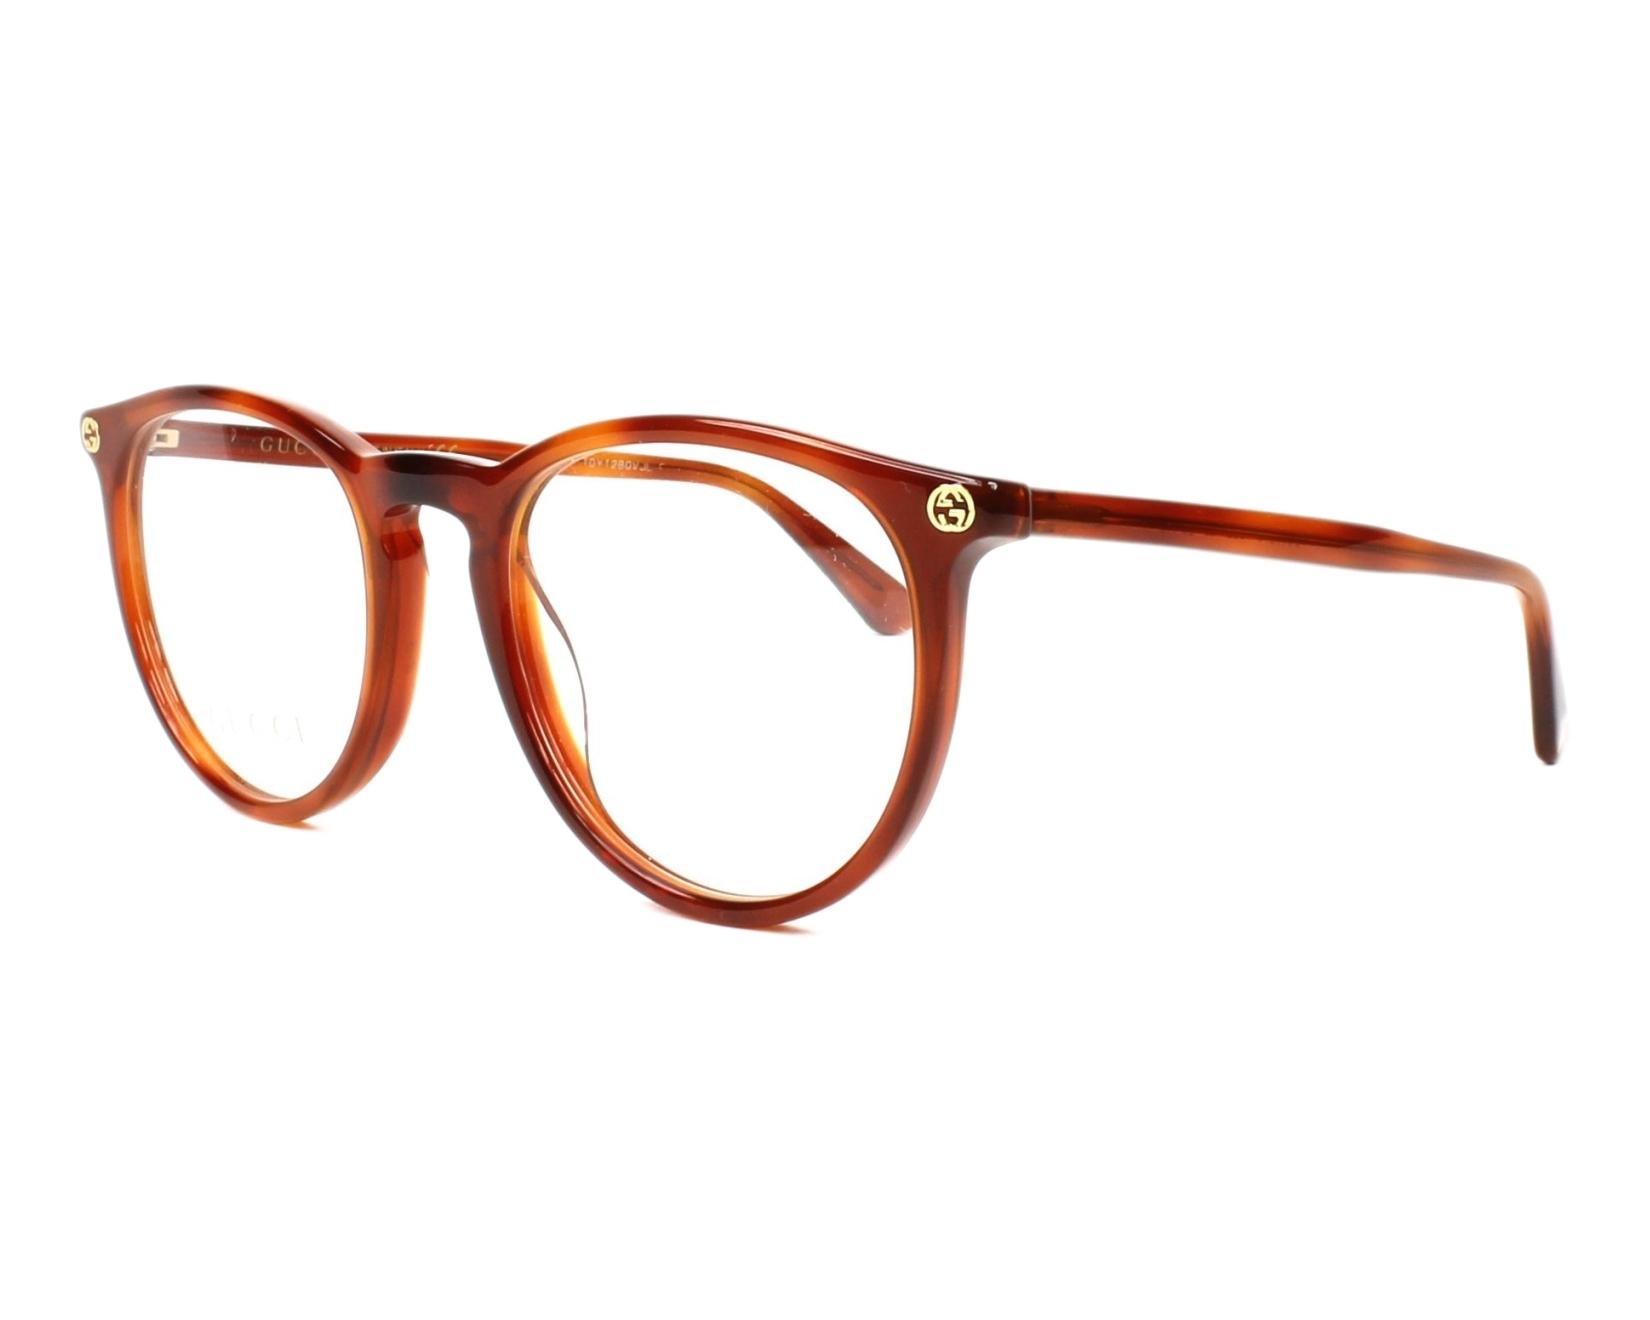 lunettes de vue gucci gg 00270 003 marron. Black Bedroom Furniture Sets. Home Design Ideas